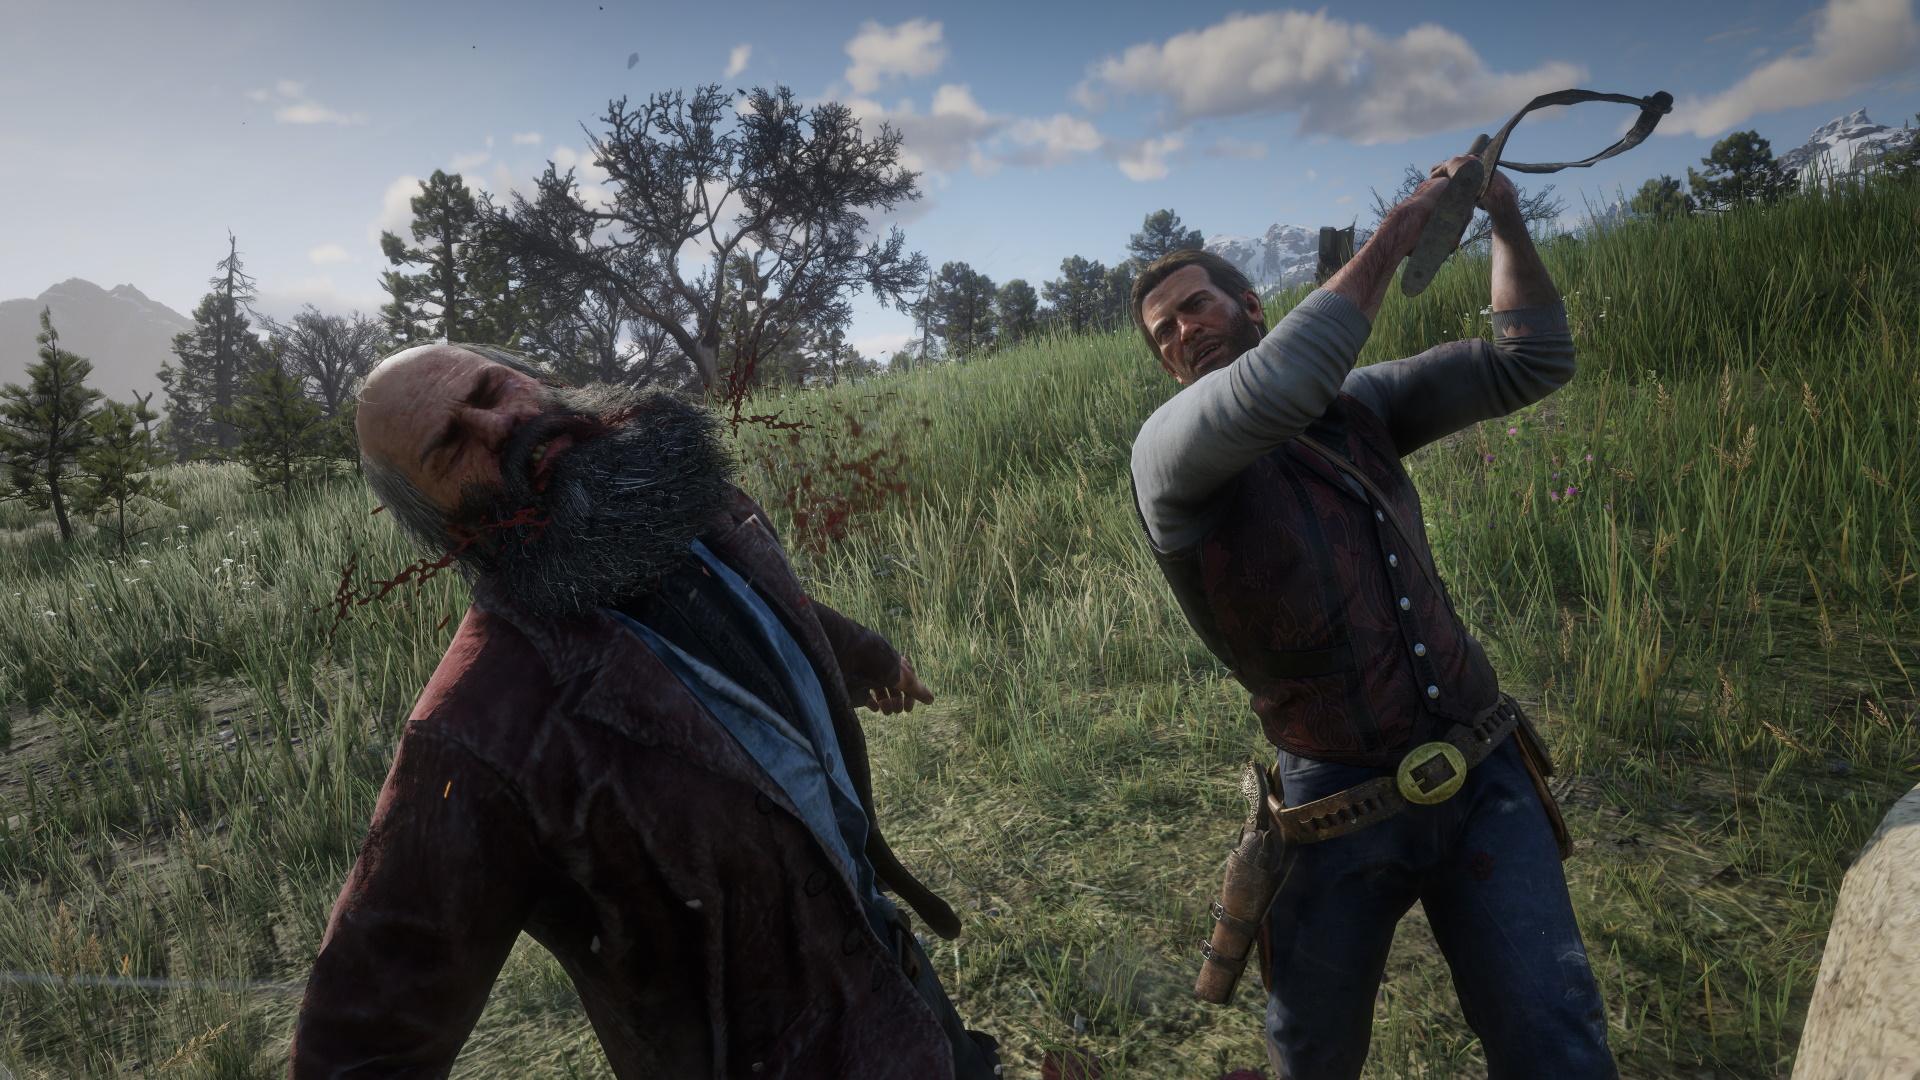 Red Dead Redemption 2 - Best Action Games 2020